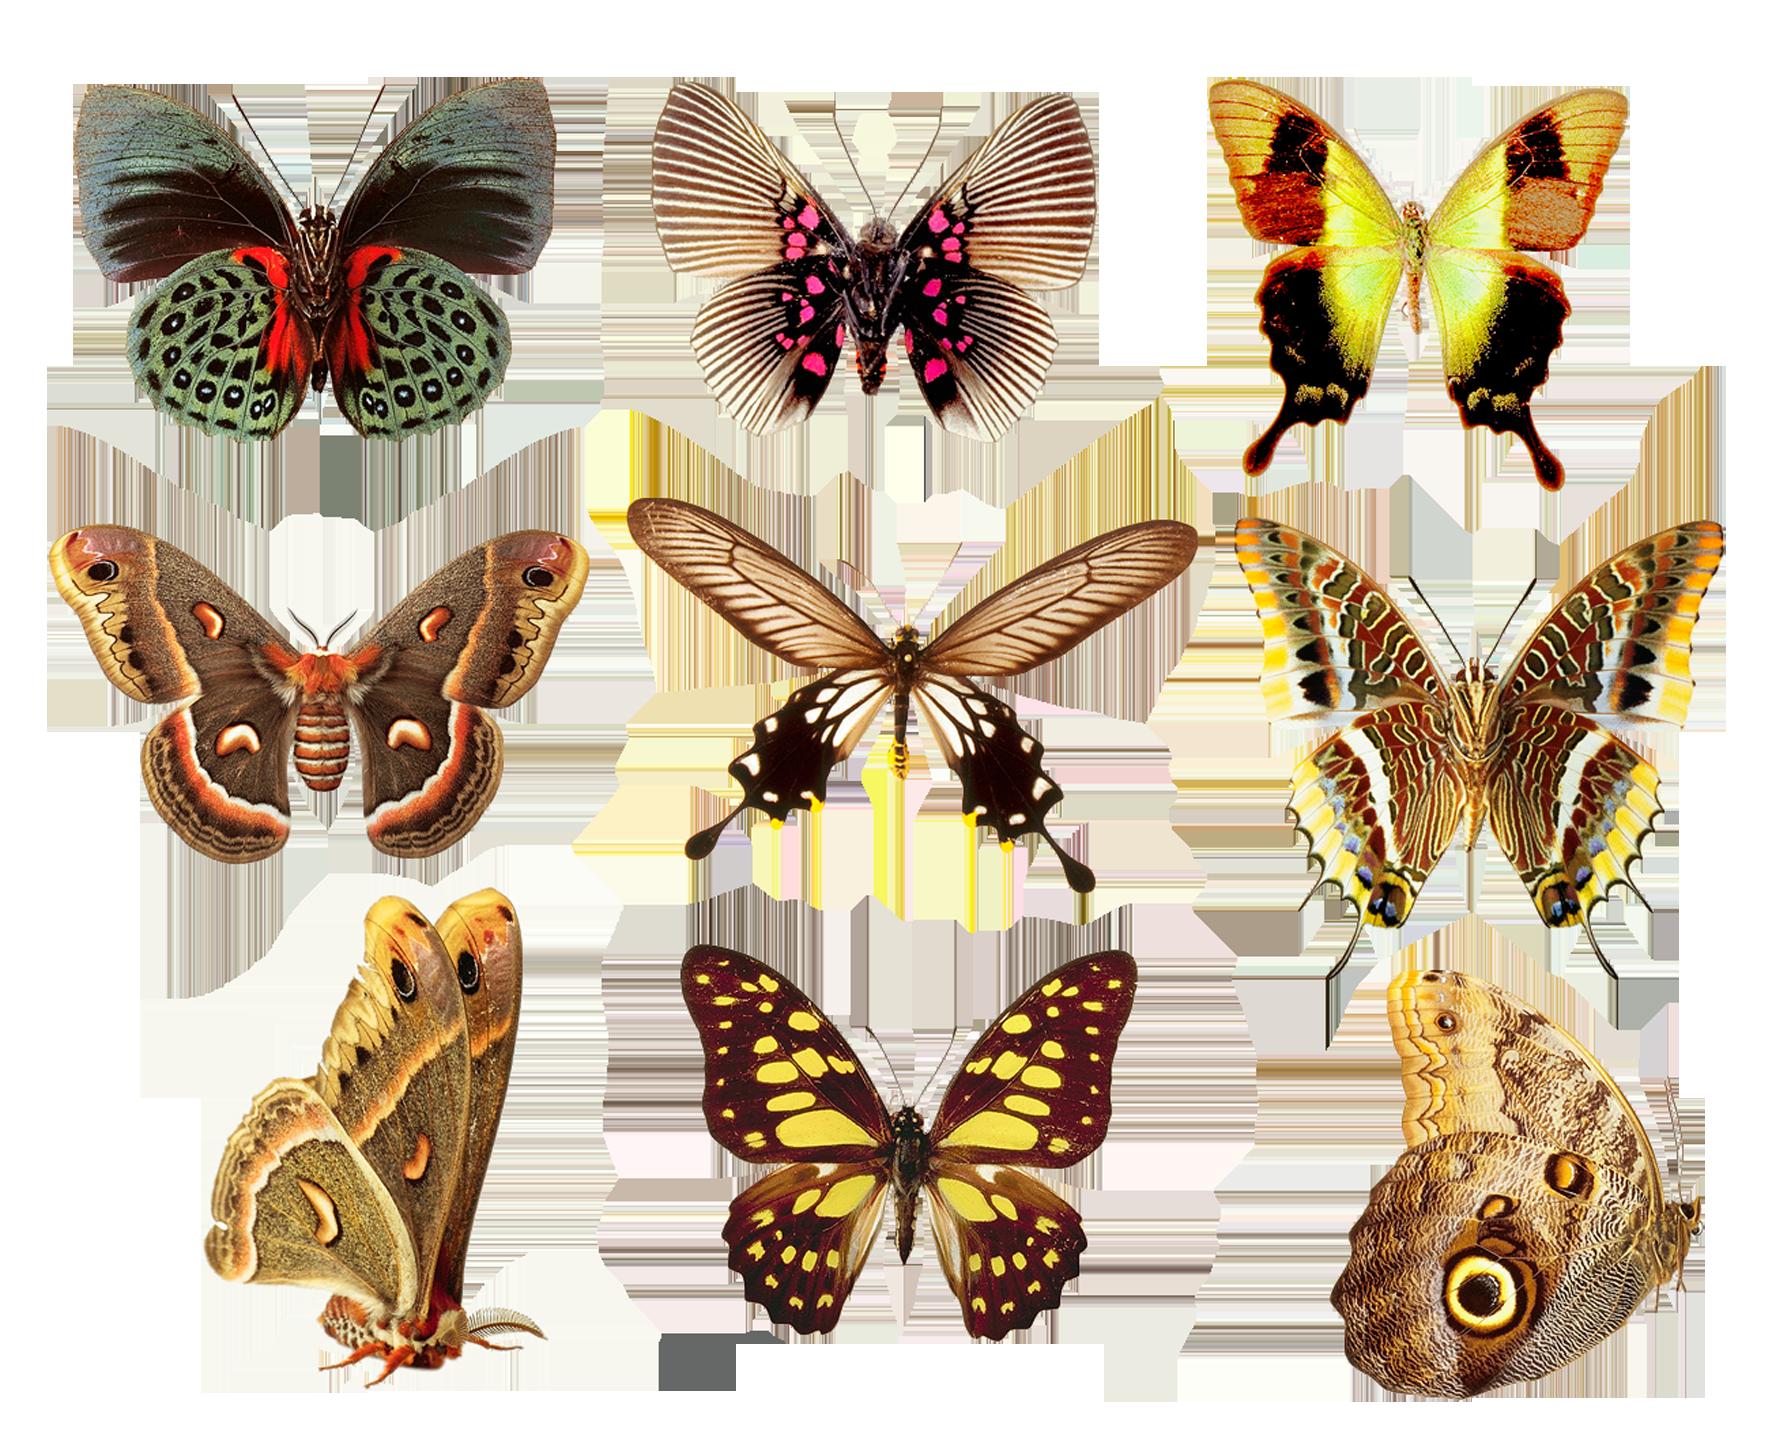 Butterflies2 png by AbsurdWordPreferred